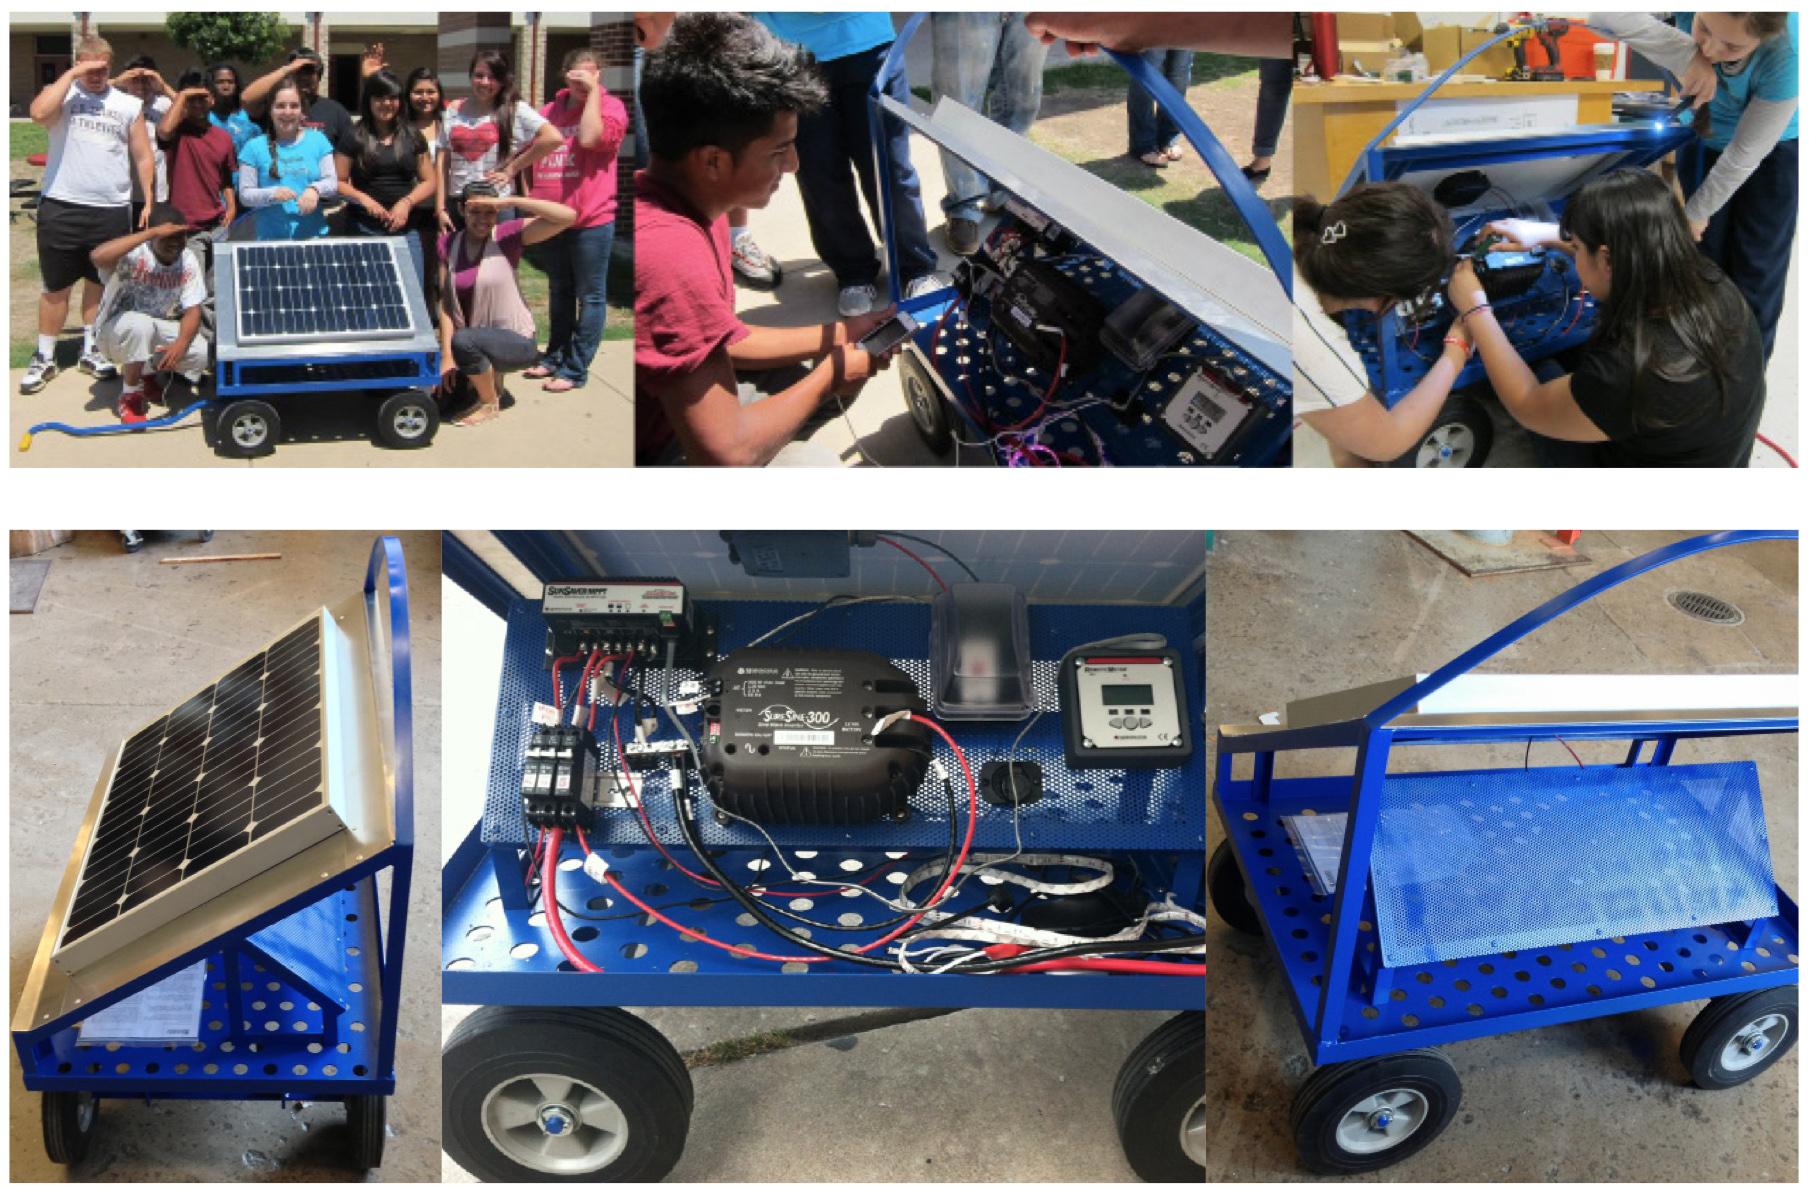 Sol Design Lab, Solar Wagon, DIY energy system: Instructables.com, 2014